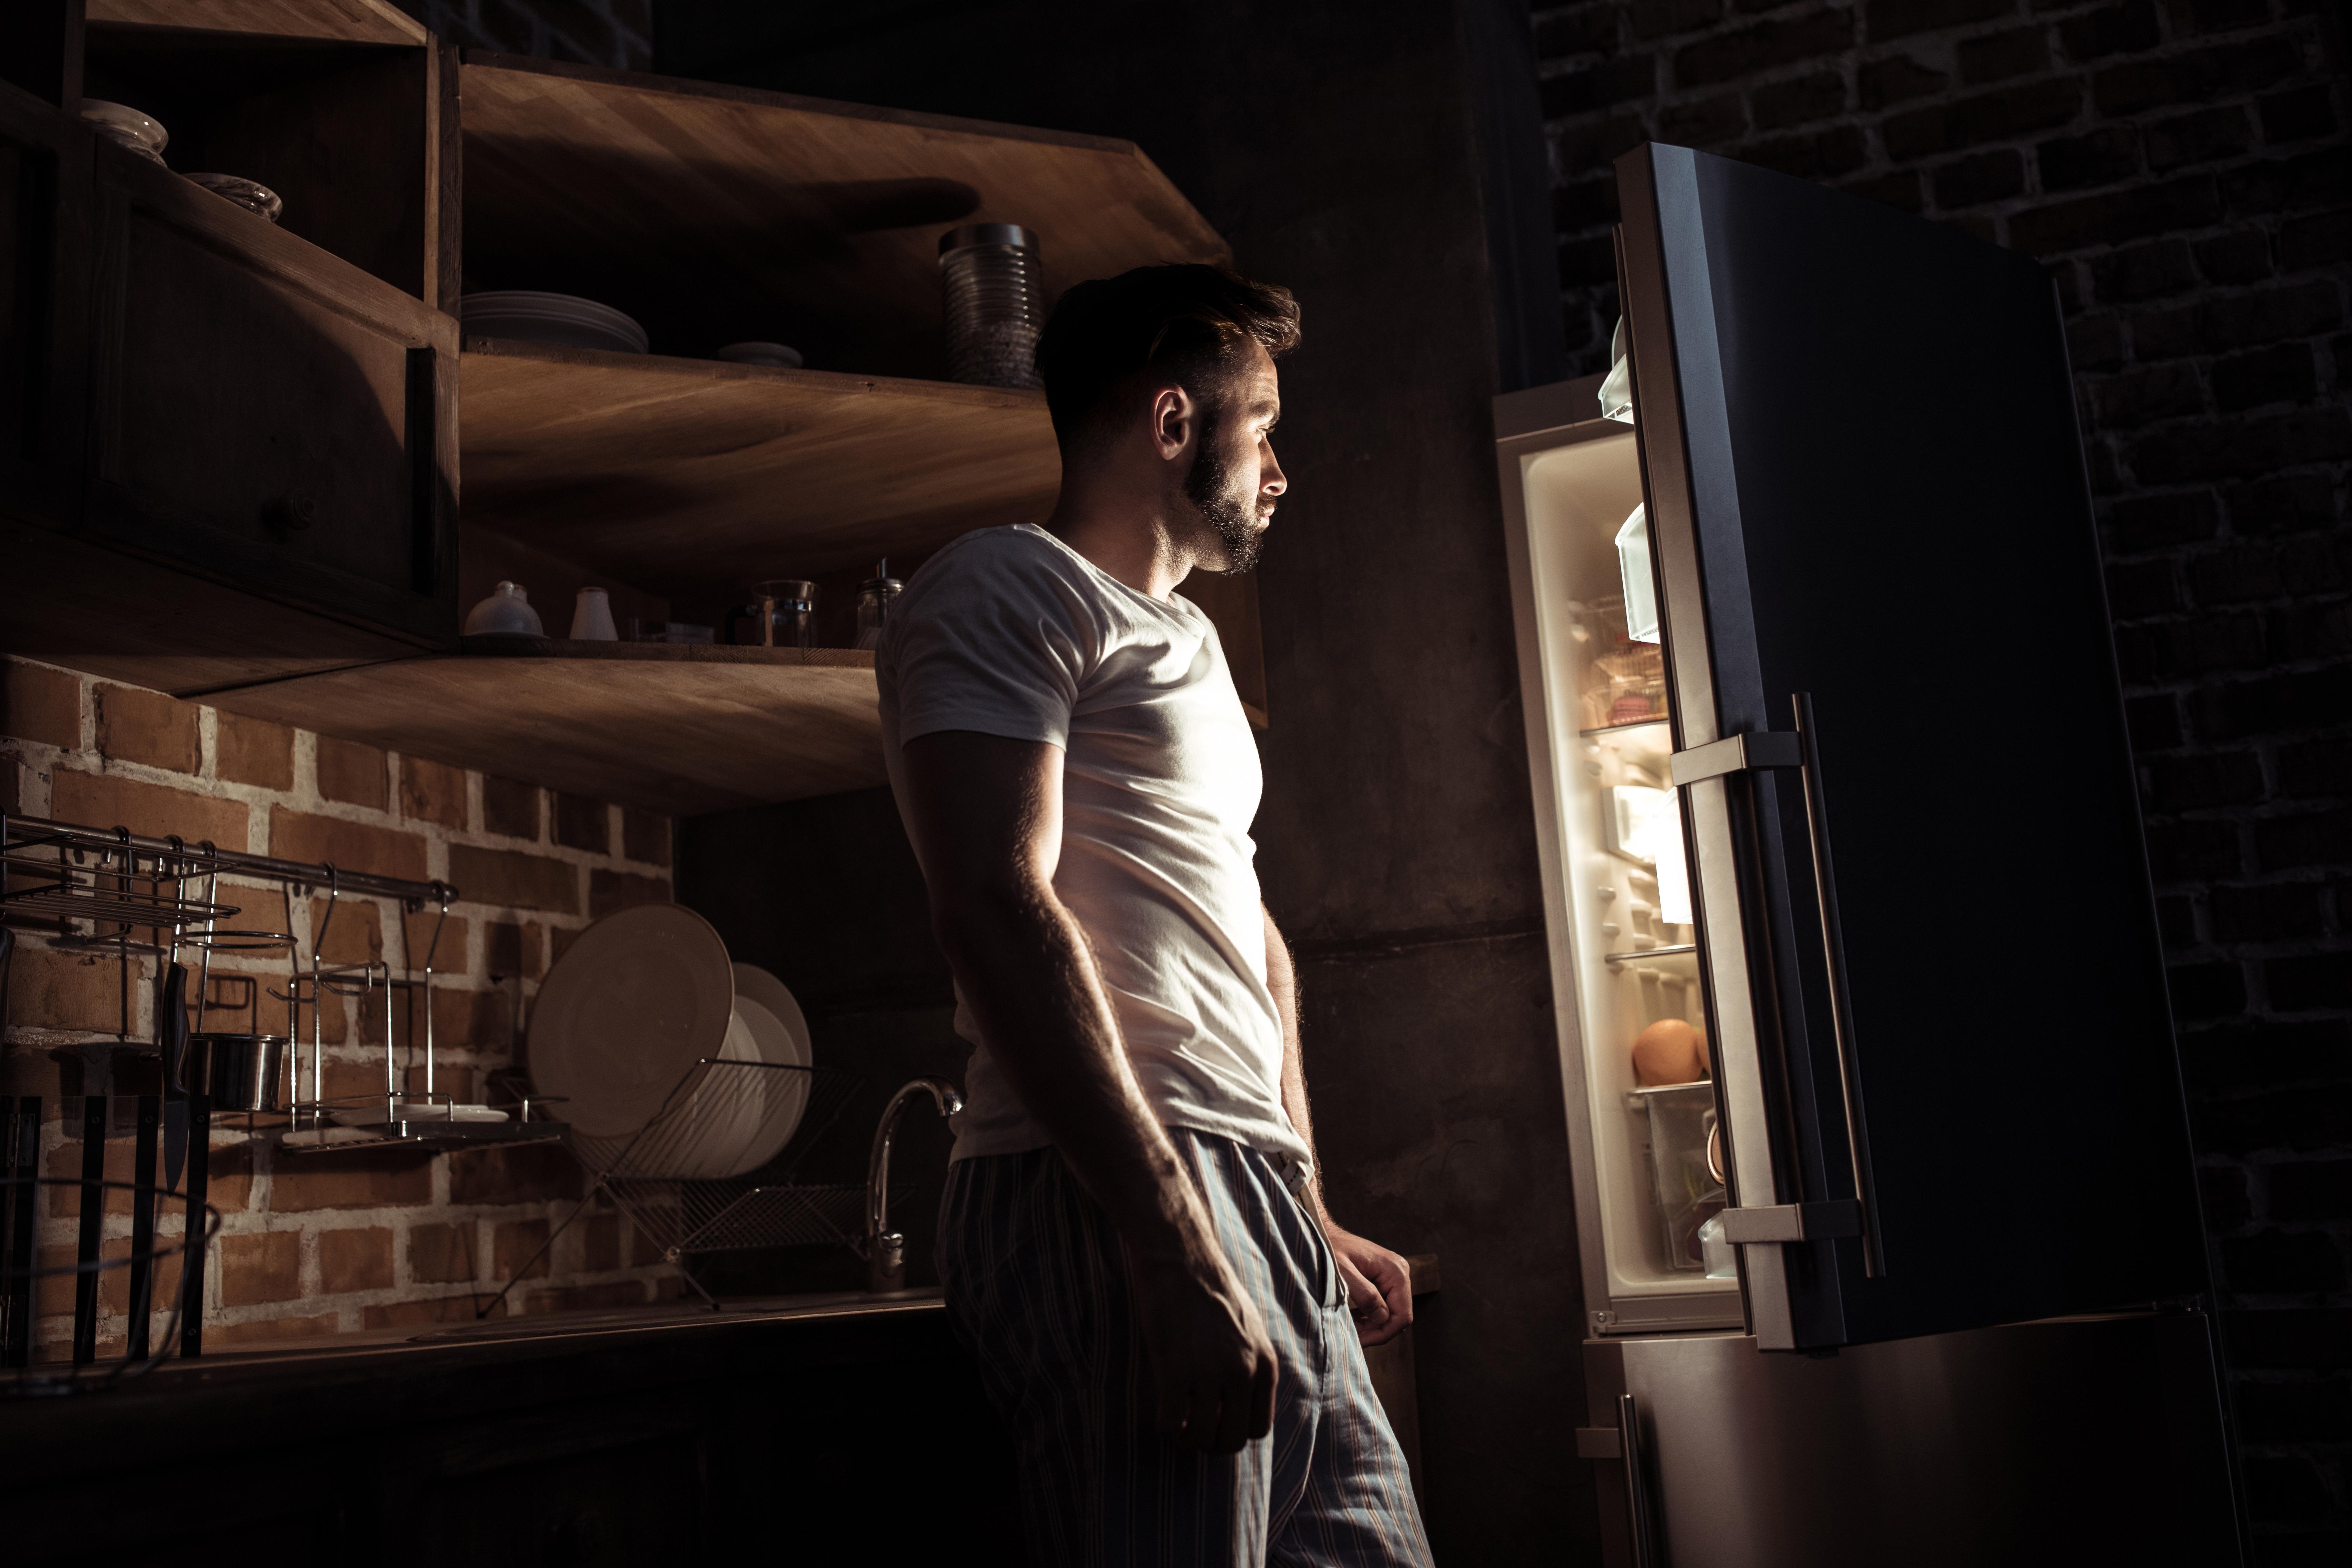 How to Fix a Dented Refrigerator Door | Hunker